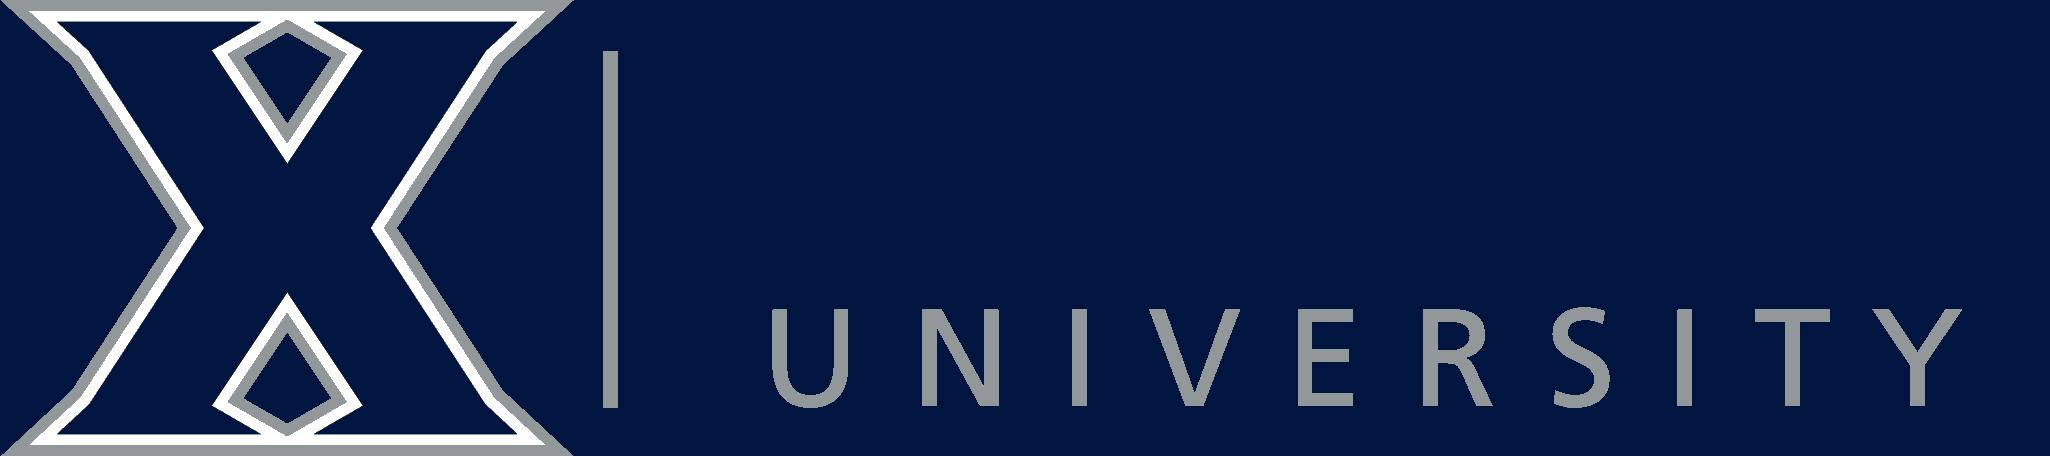 xavier university logo 9782